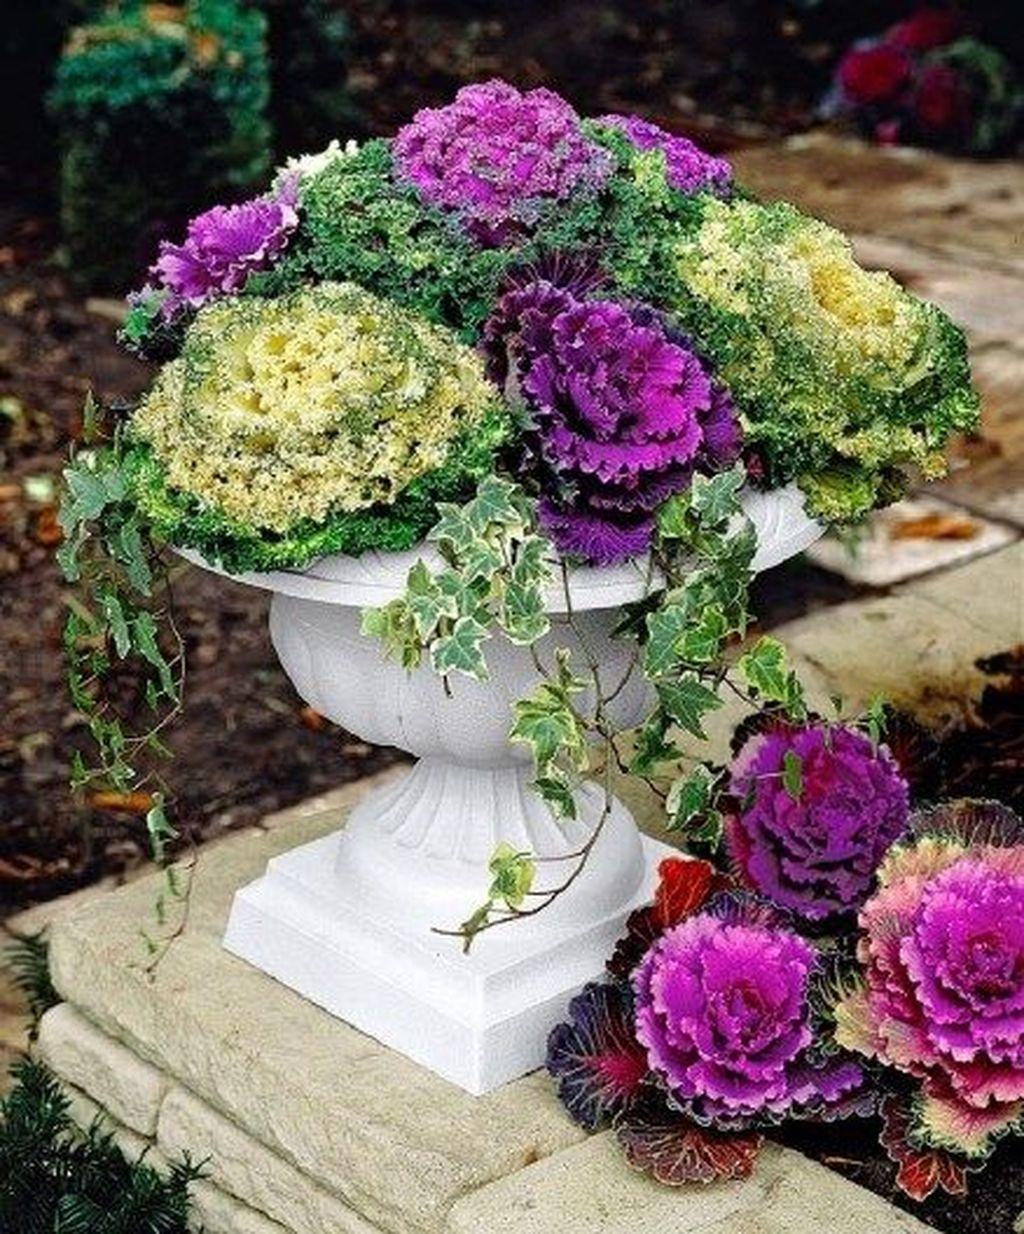 Inspiring Winter Container Gardening Ideas 27